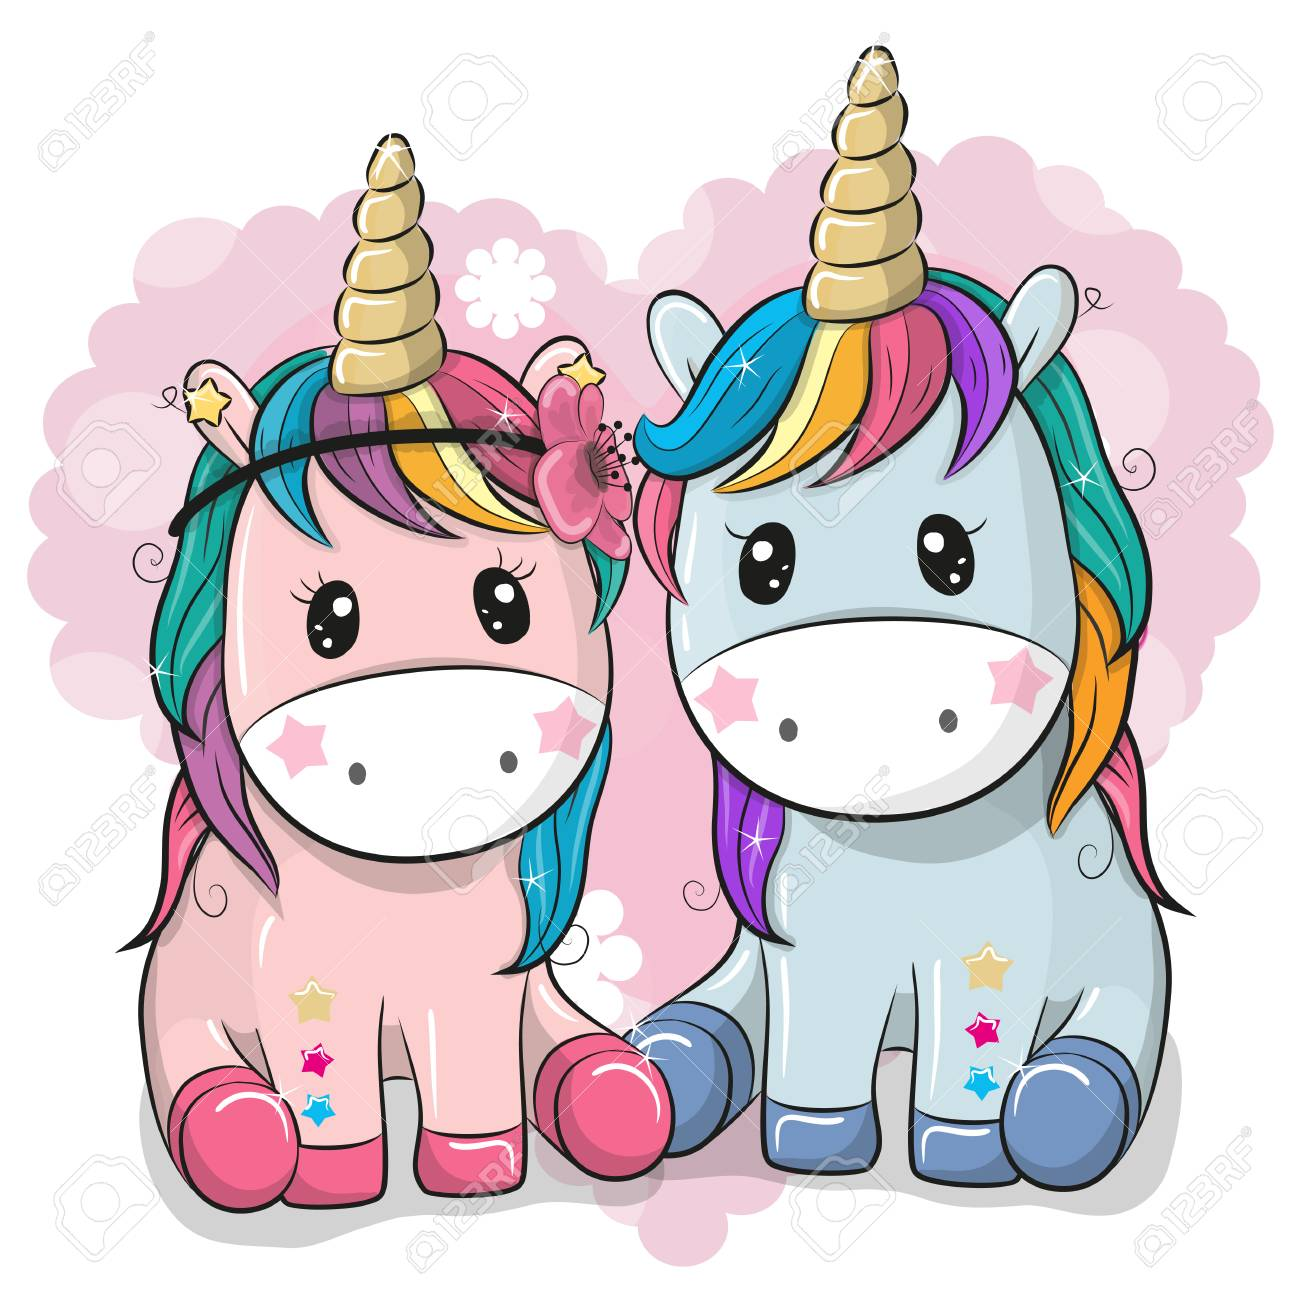 Two Cute Cartoon Unicorns on a heart background - 98834941